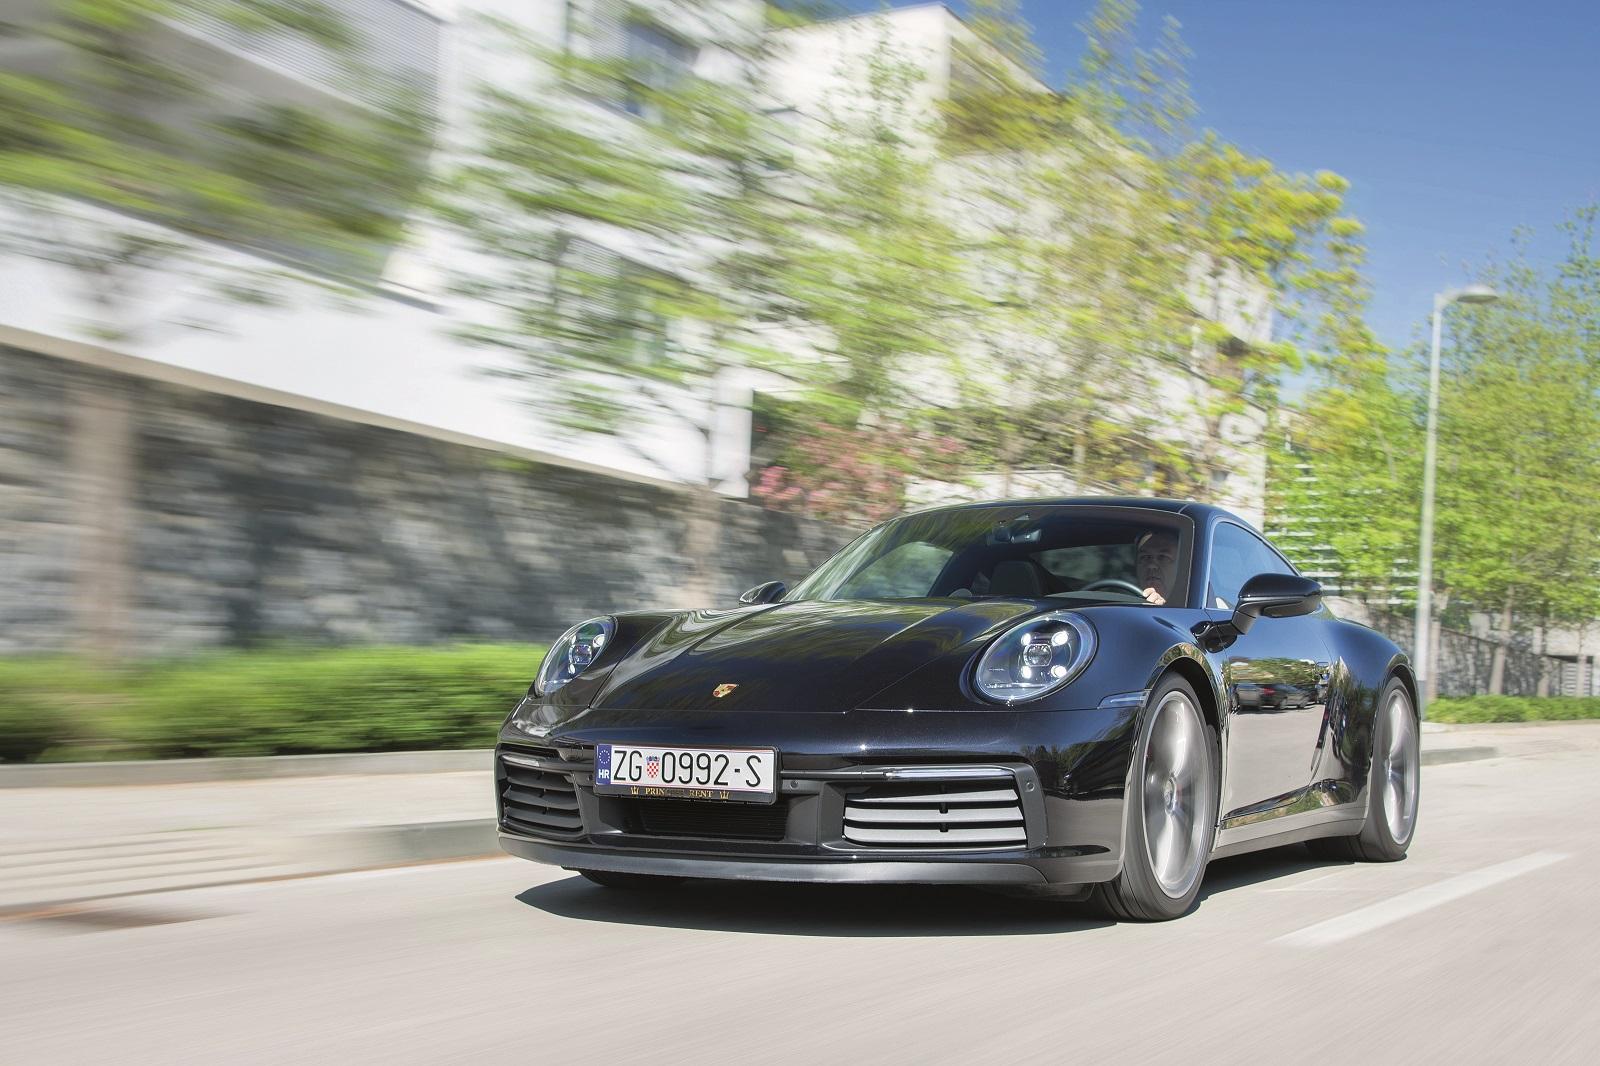 Zagreb, 200420. Porsche 911. Foto: Marko Miscevic / Cropix -auto klub-